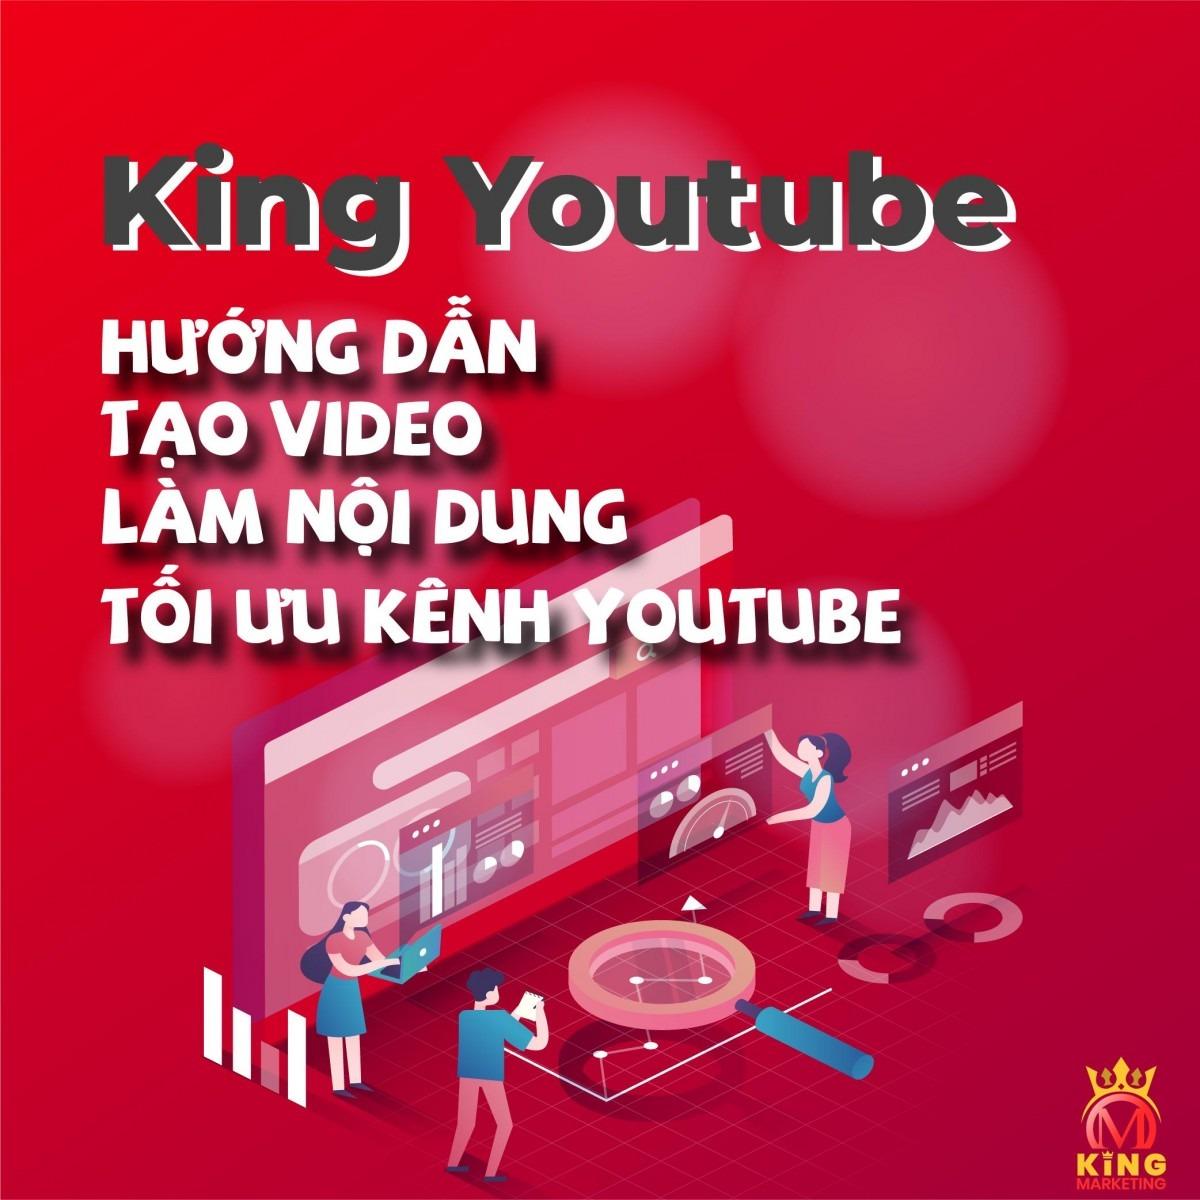 King Youtube